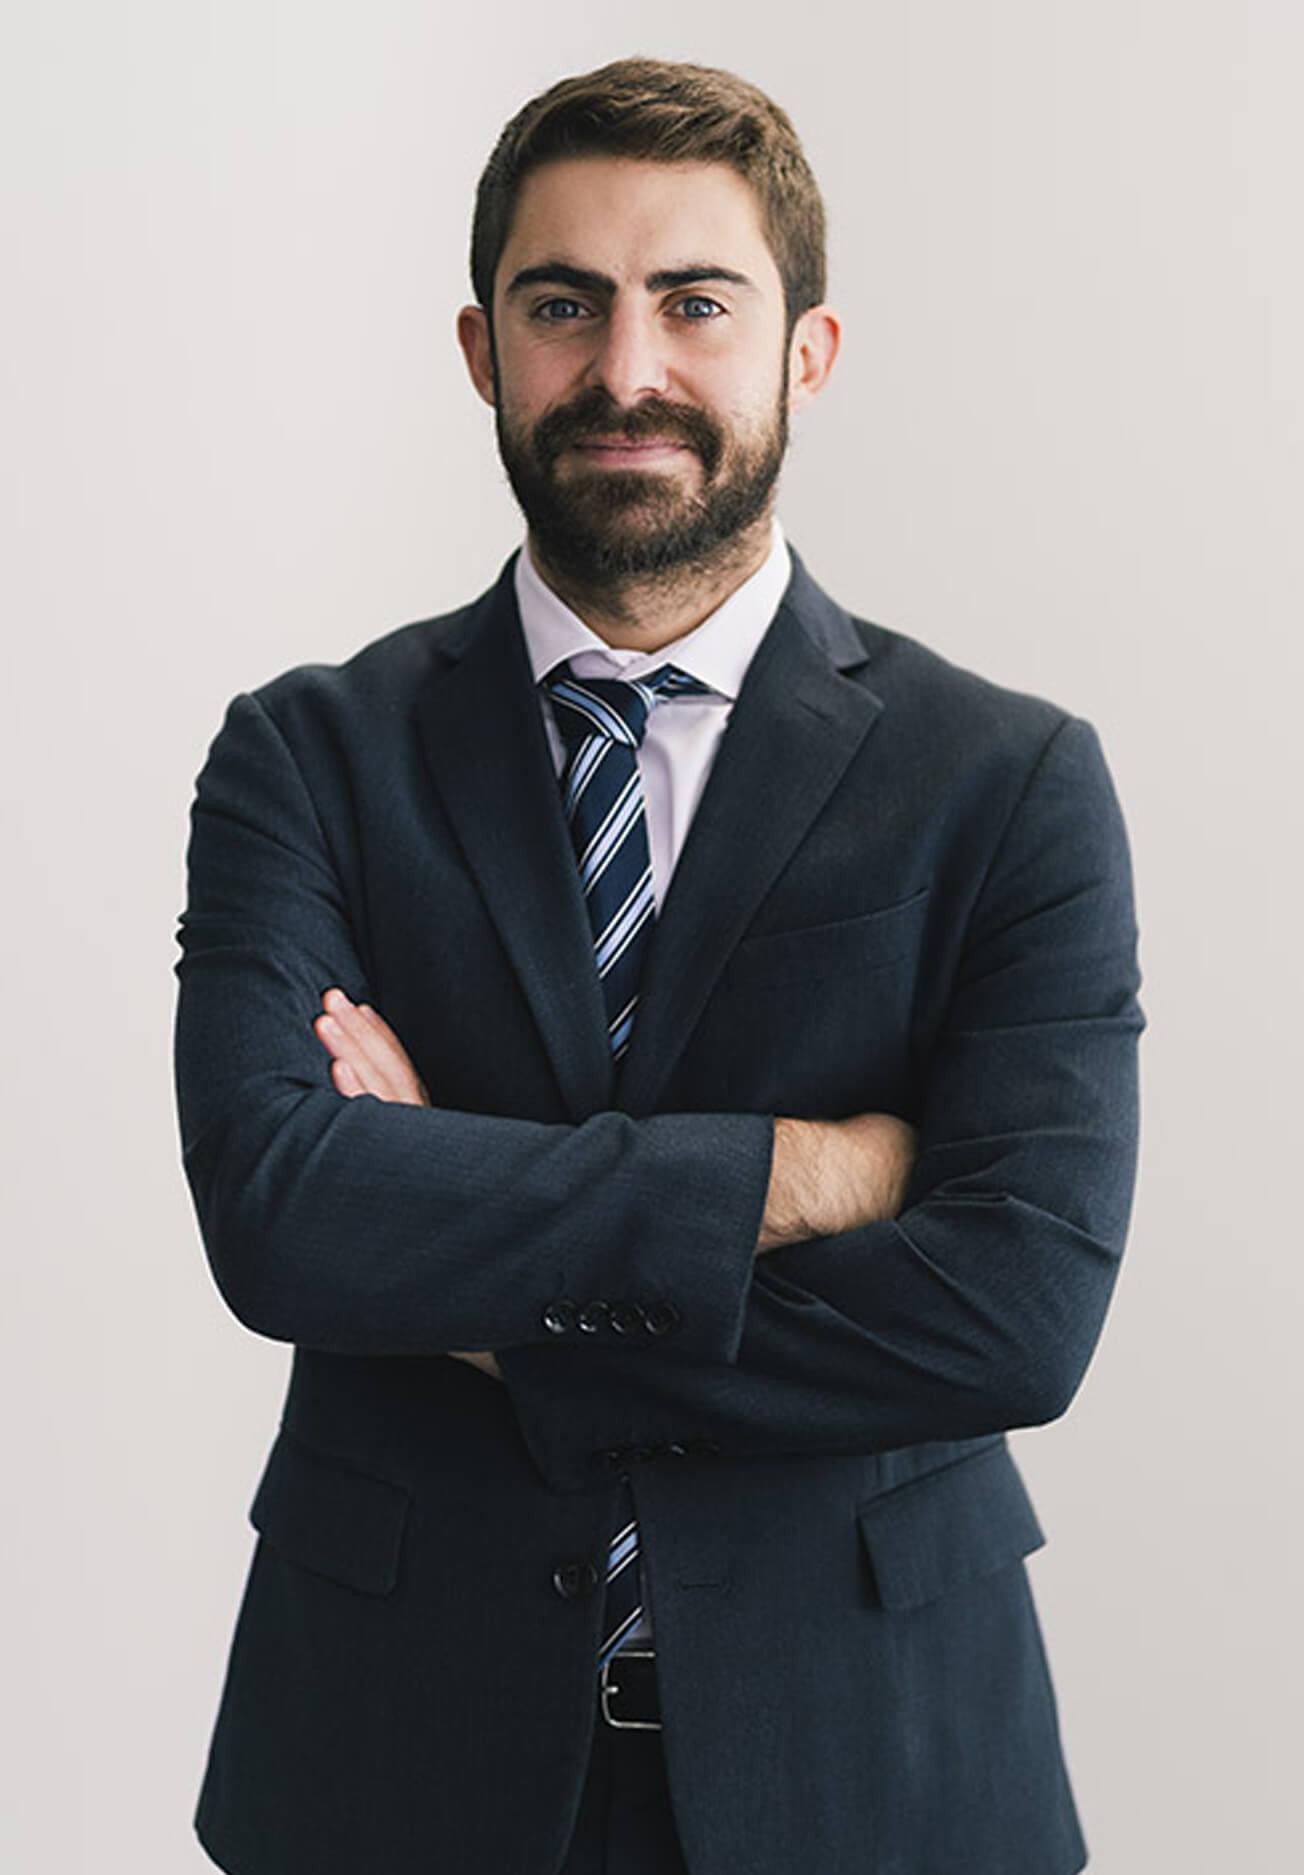 Ignacio Pinedo